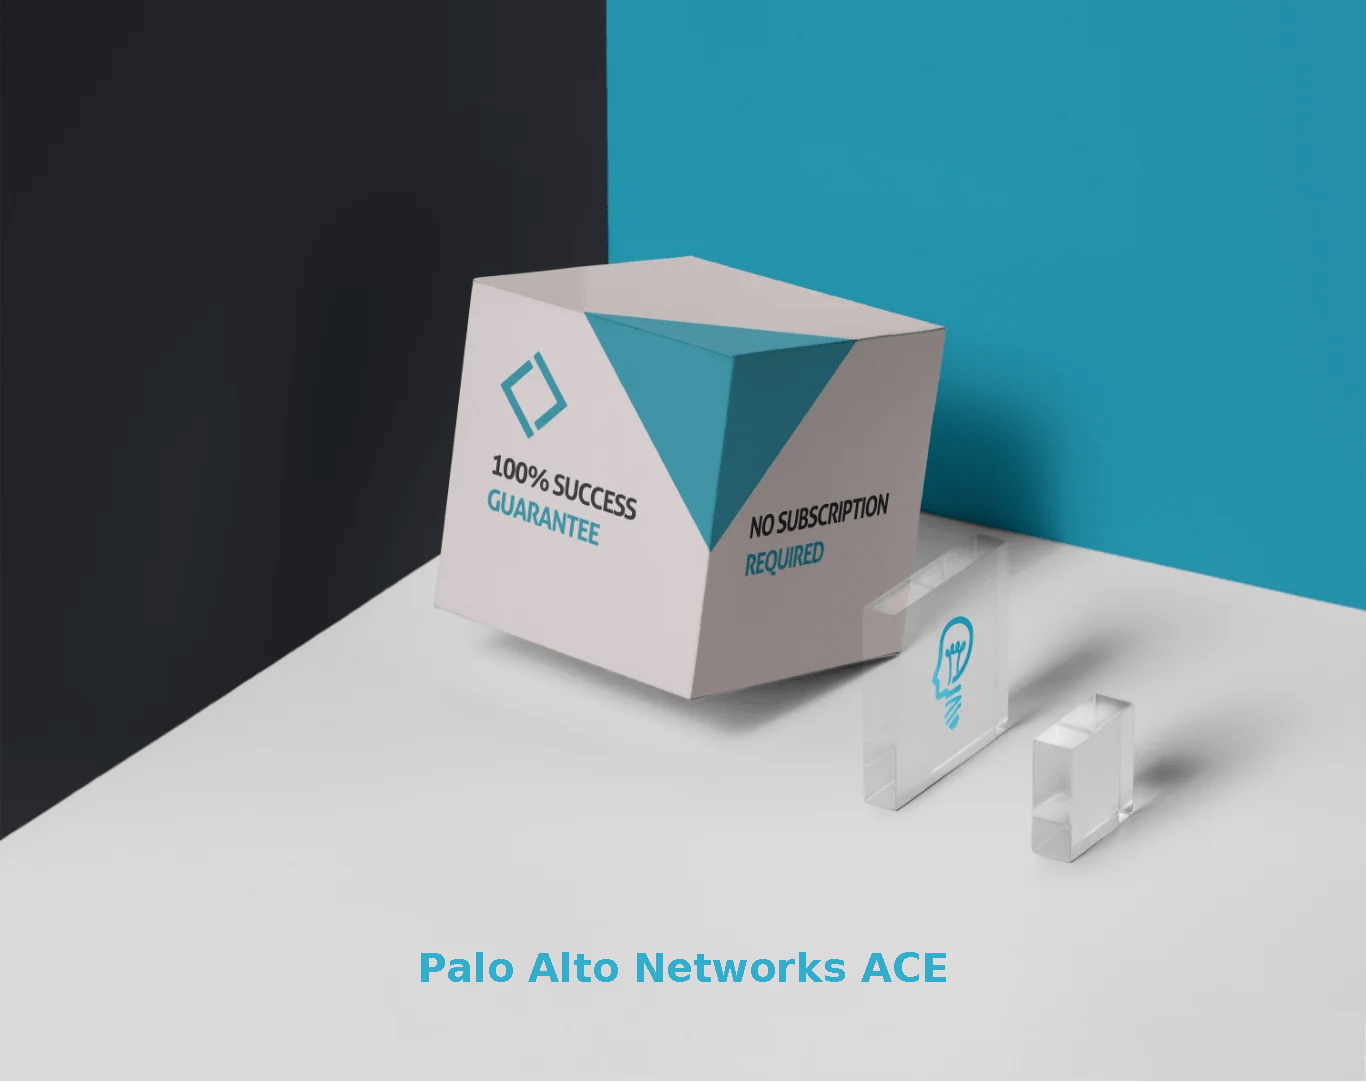 Palo Alto Networks ACE Exams